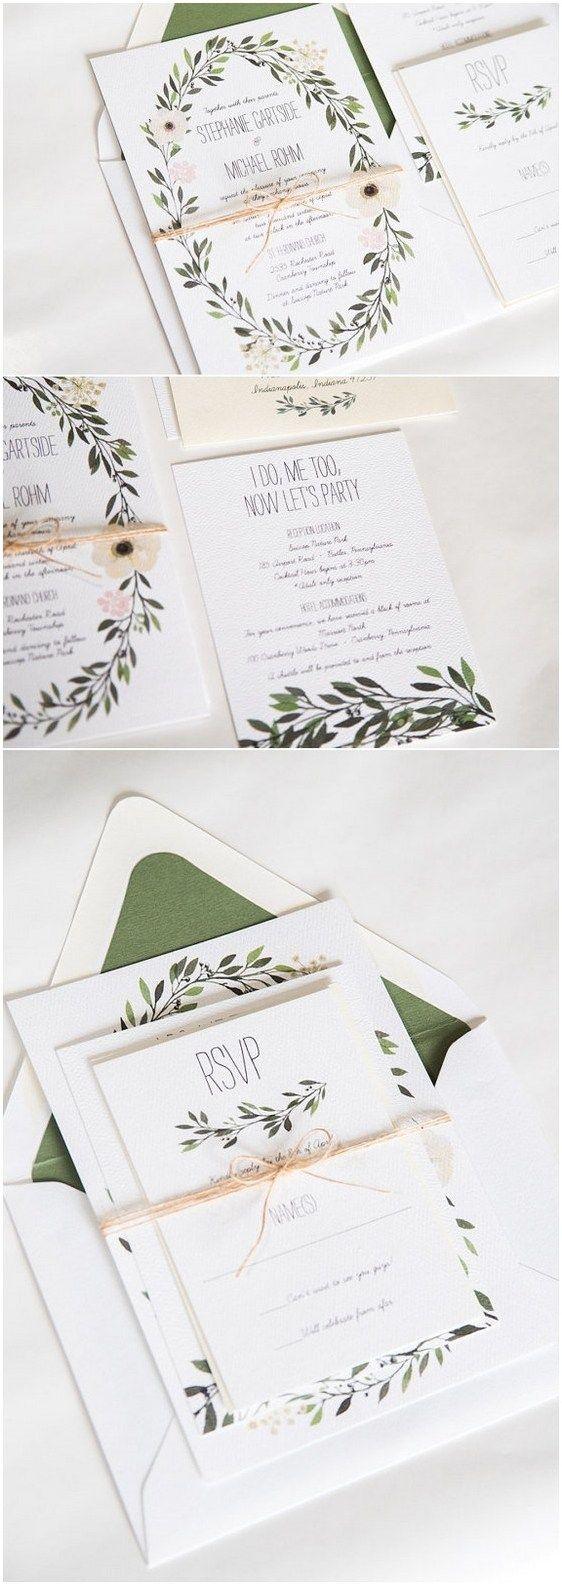 Rustic Wedding Invitation (1)   Weddings, Wedding graphics and ...